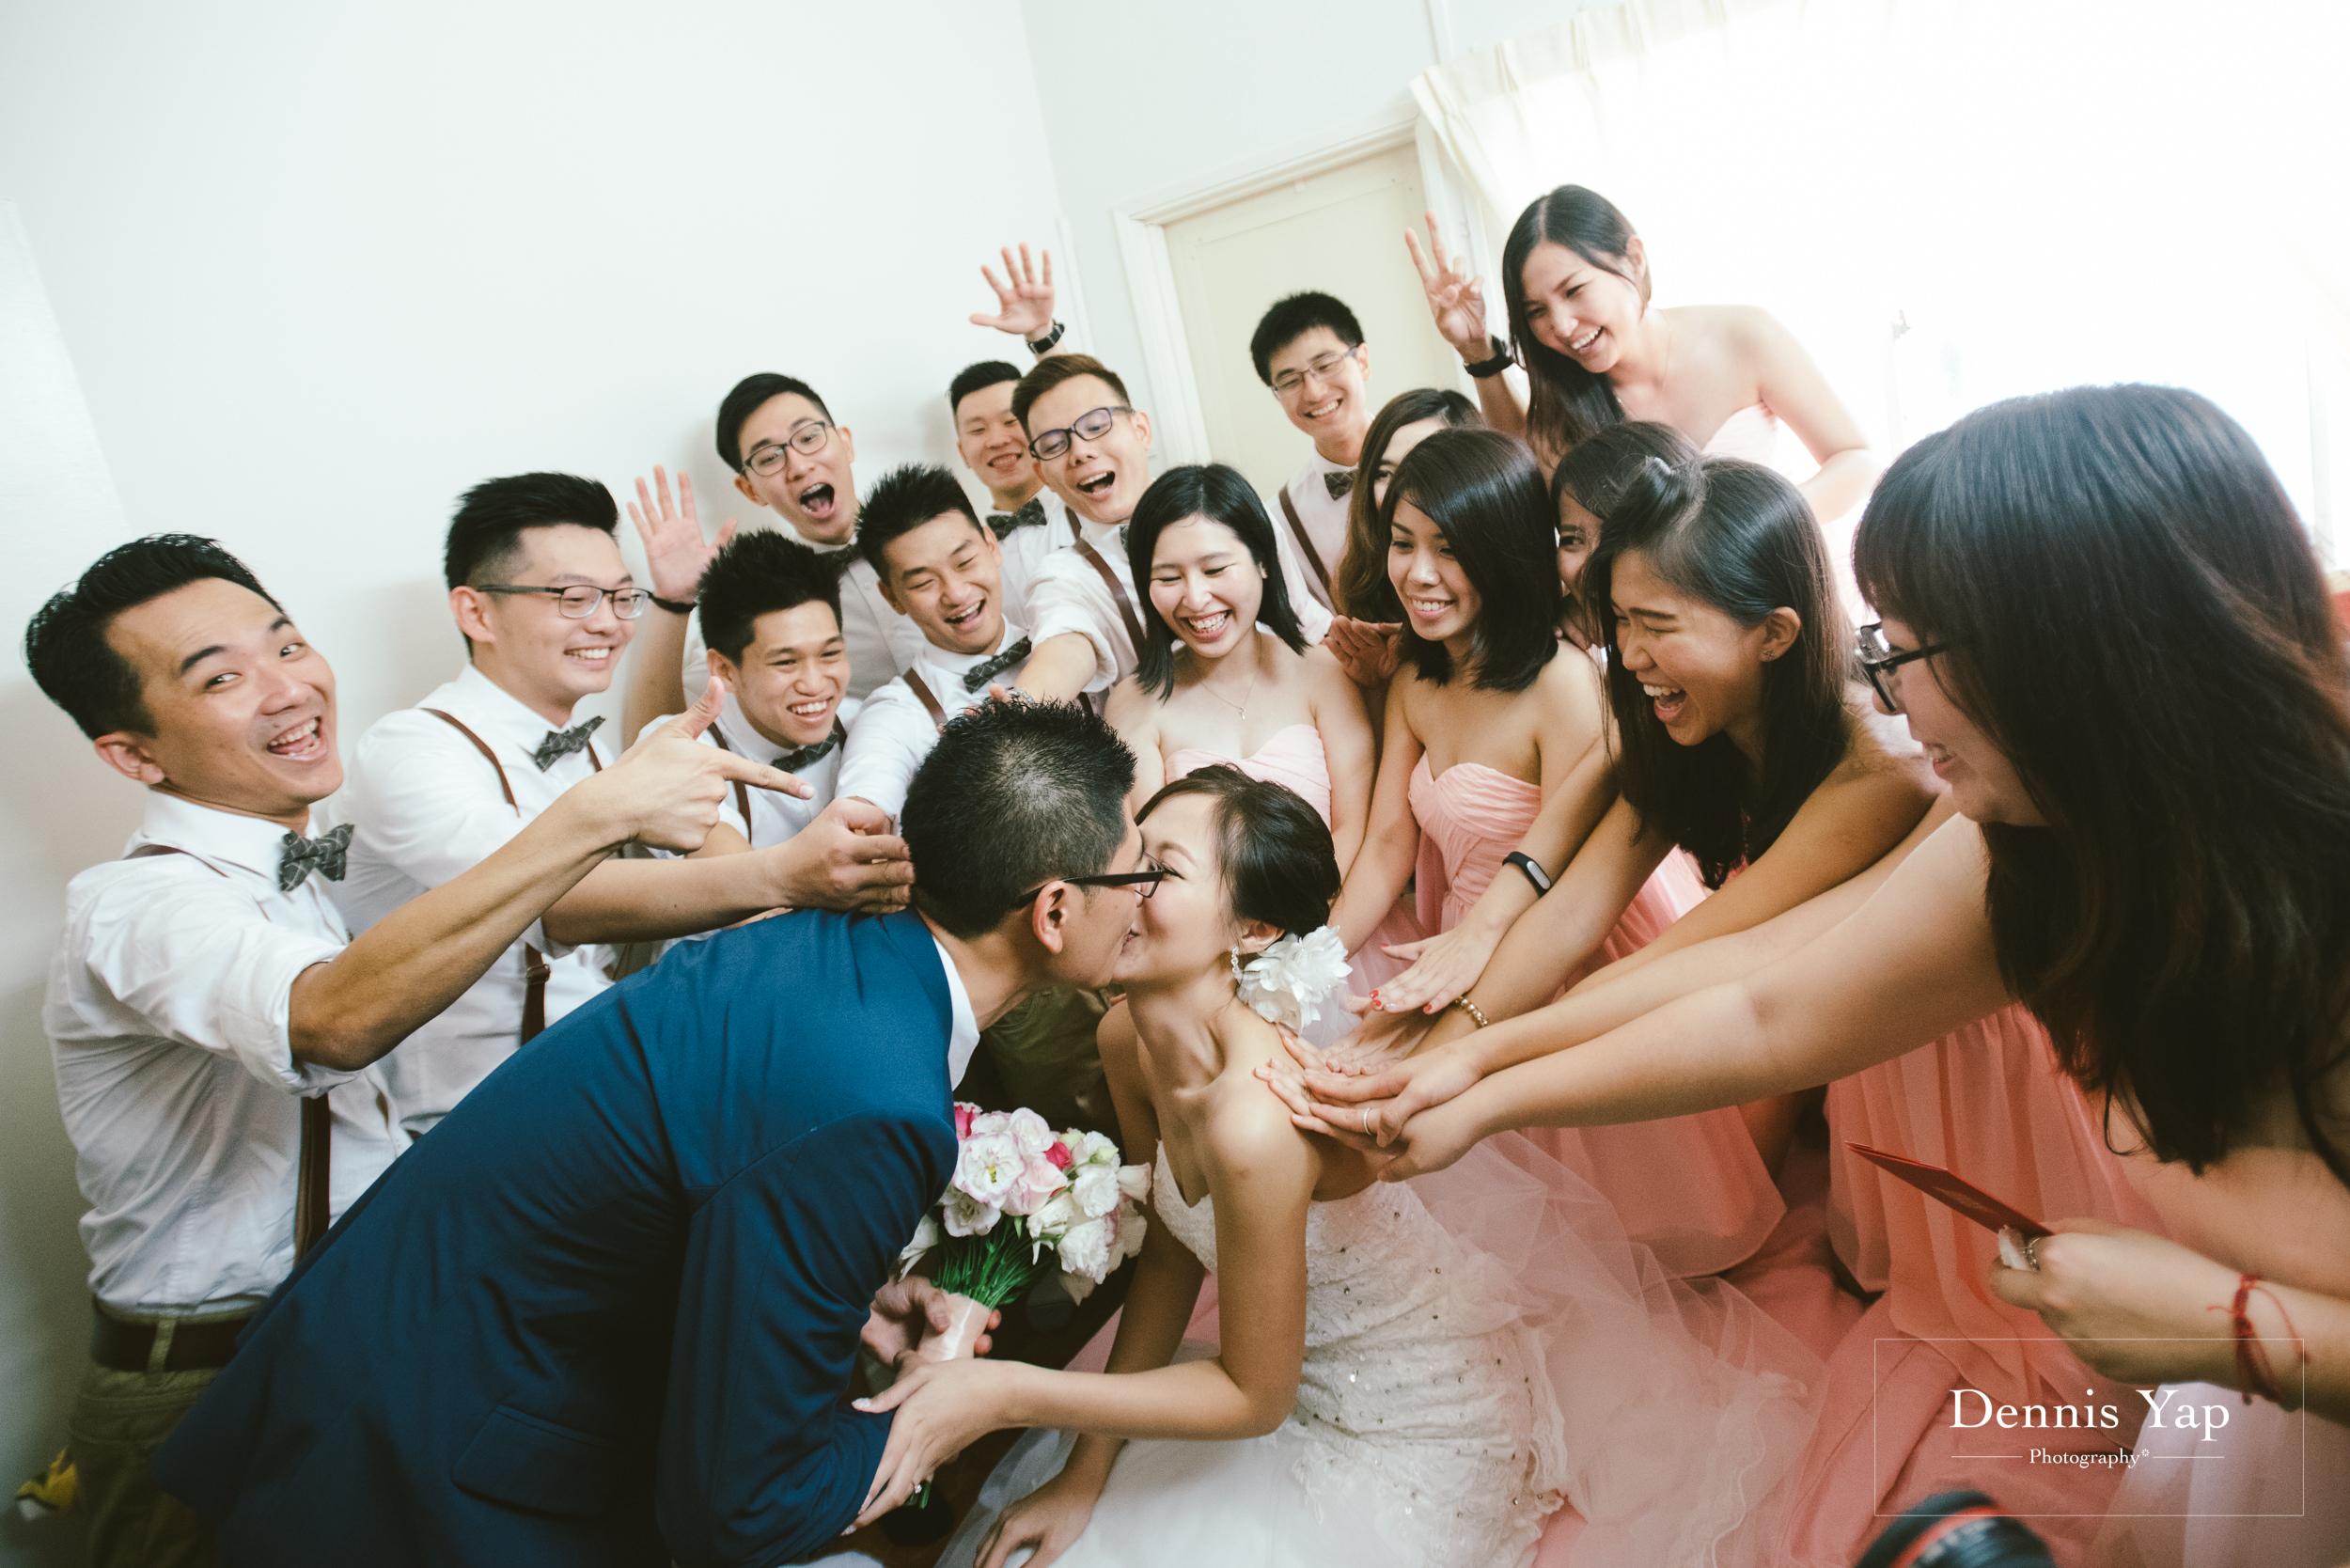 kok seong pui ling wedding day dennis yap photography malaysia top wedding-20.jpg